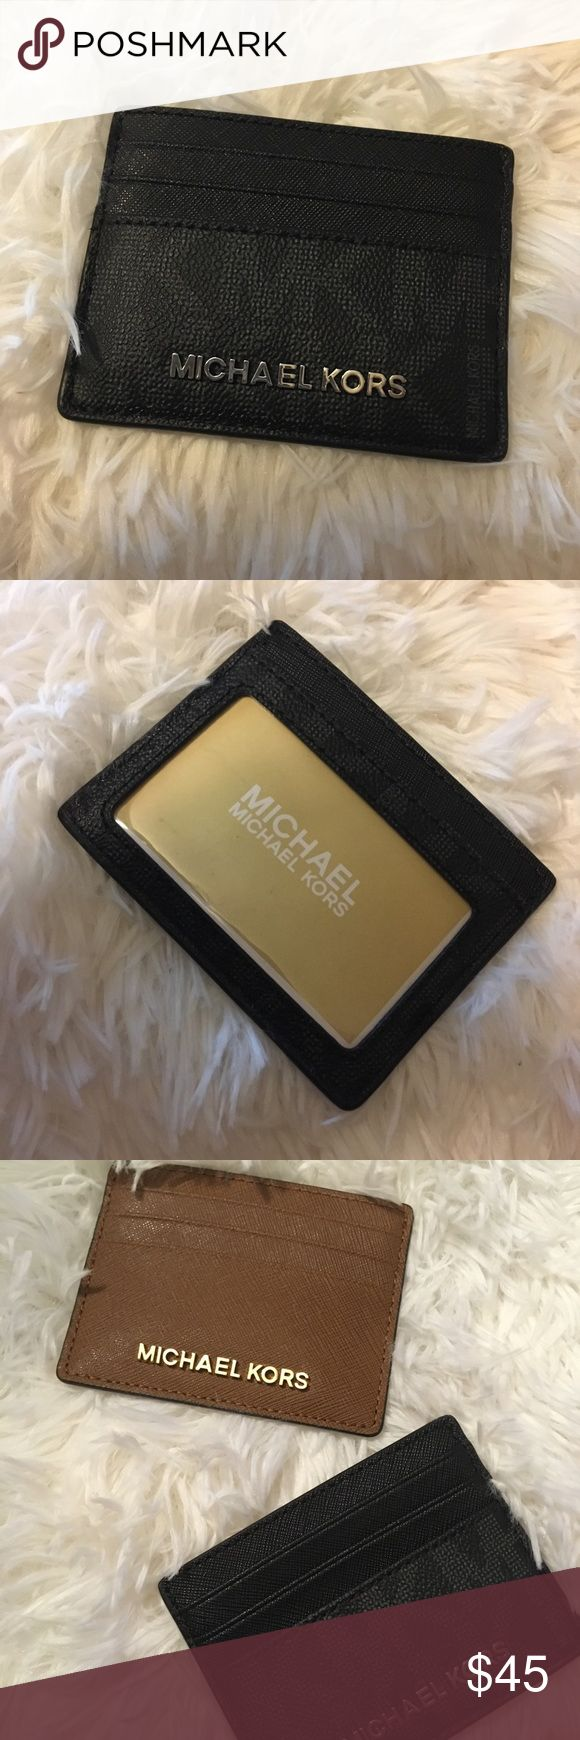 New Michael Kors jet set card holder leather New Michael Kors jet set card holder leather  Retail 68$   Black Michael Kors Bags Wallets